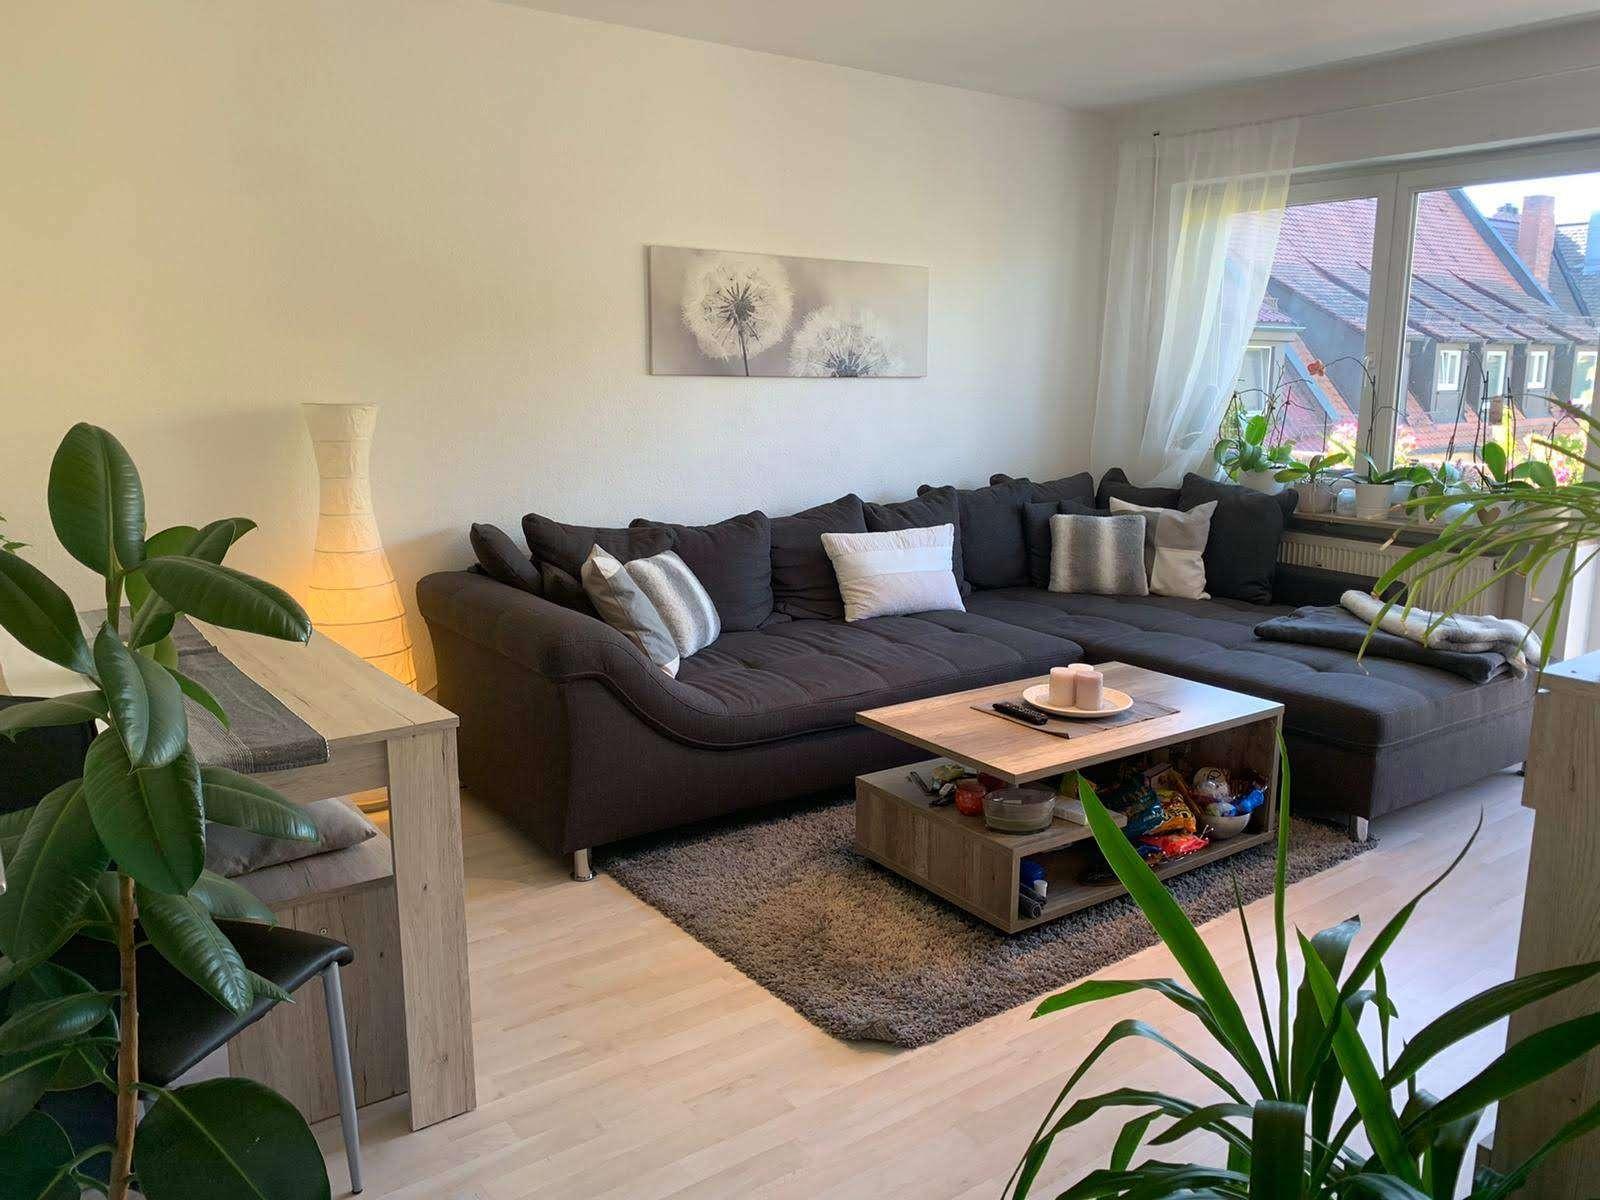 Helle drei Zimmer Wohnung mit Balkon in Nürnberg, Wöhrd in Veilhof (Nürnberg)